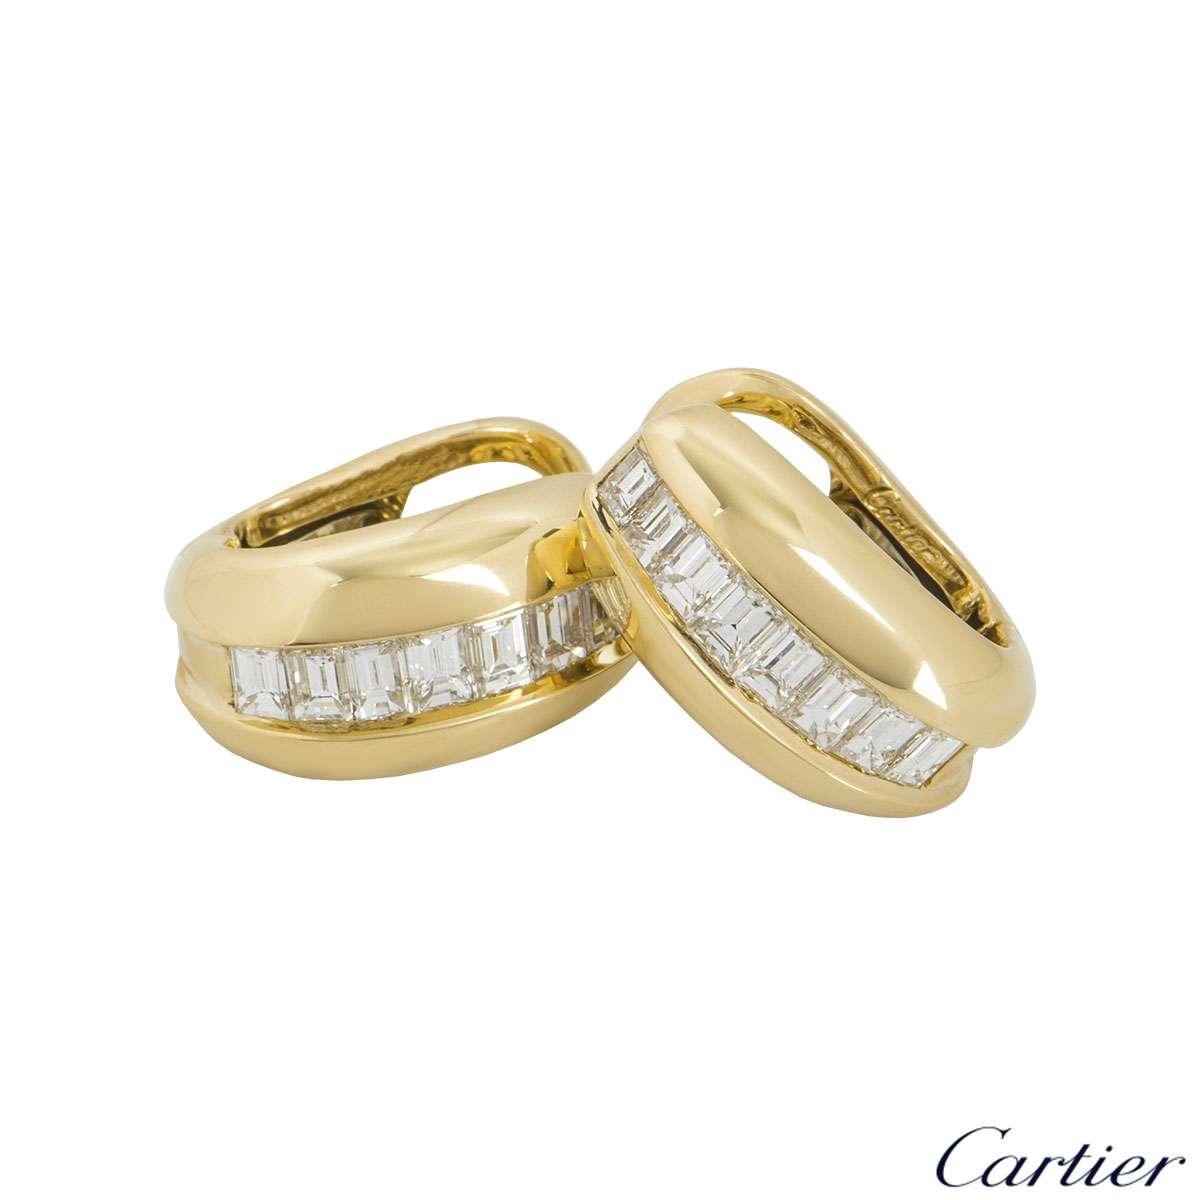 Cartier Yellow Gold Bombe Diamond Earrings